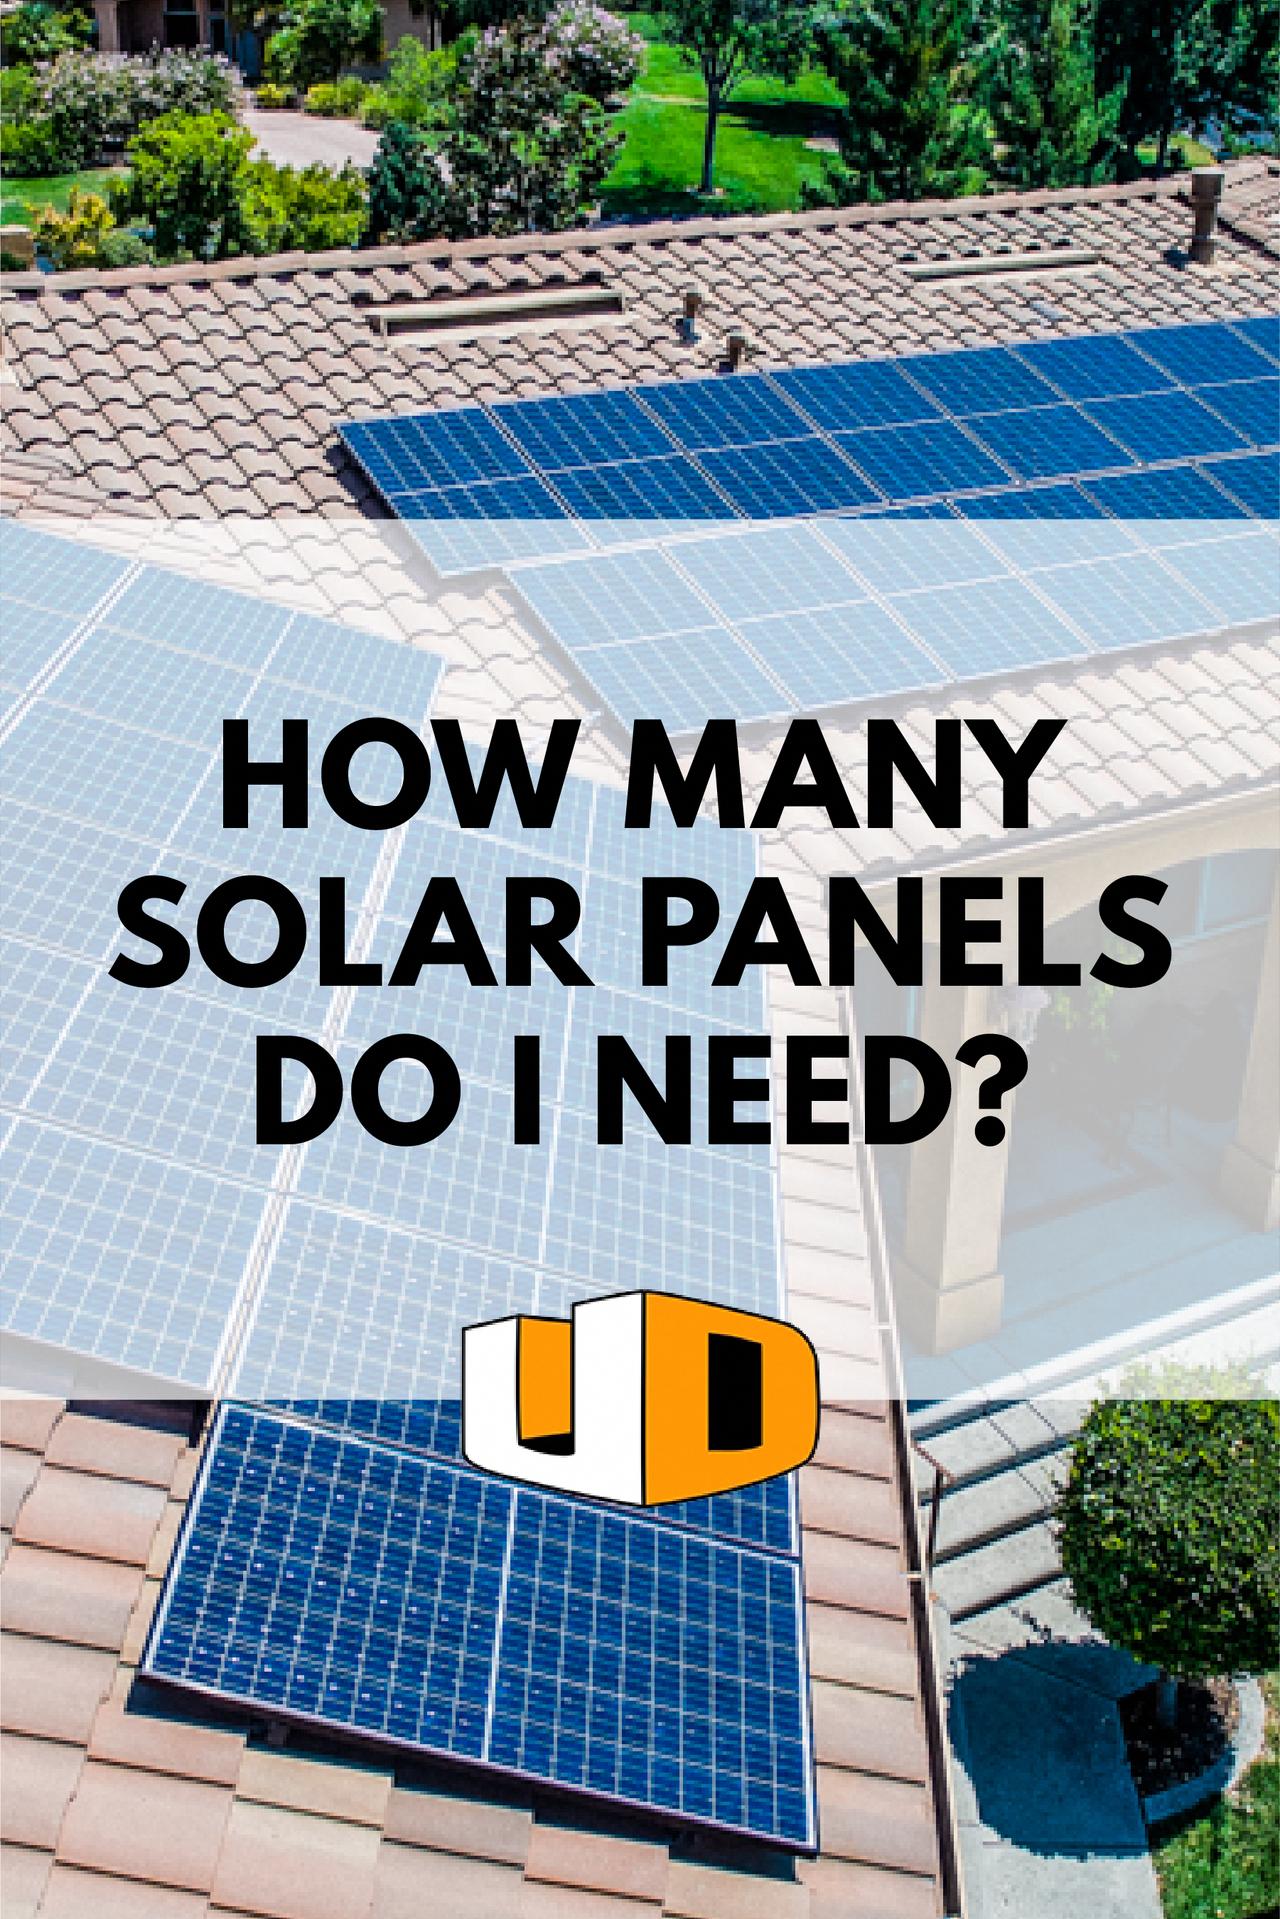 Solarpanels Solarenergy Solarpower Solargenerator Solarpanelkits Solarwaterheater Solarshingles Solarcell Solarpowersys In 2020 Solar Panels Solar Energy Panels Solar